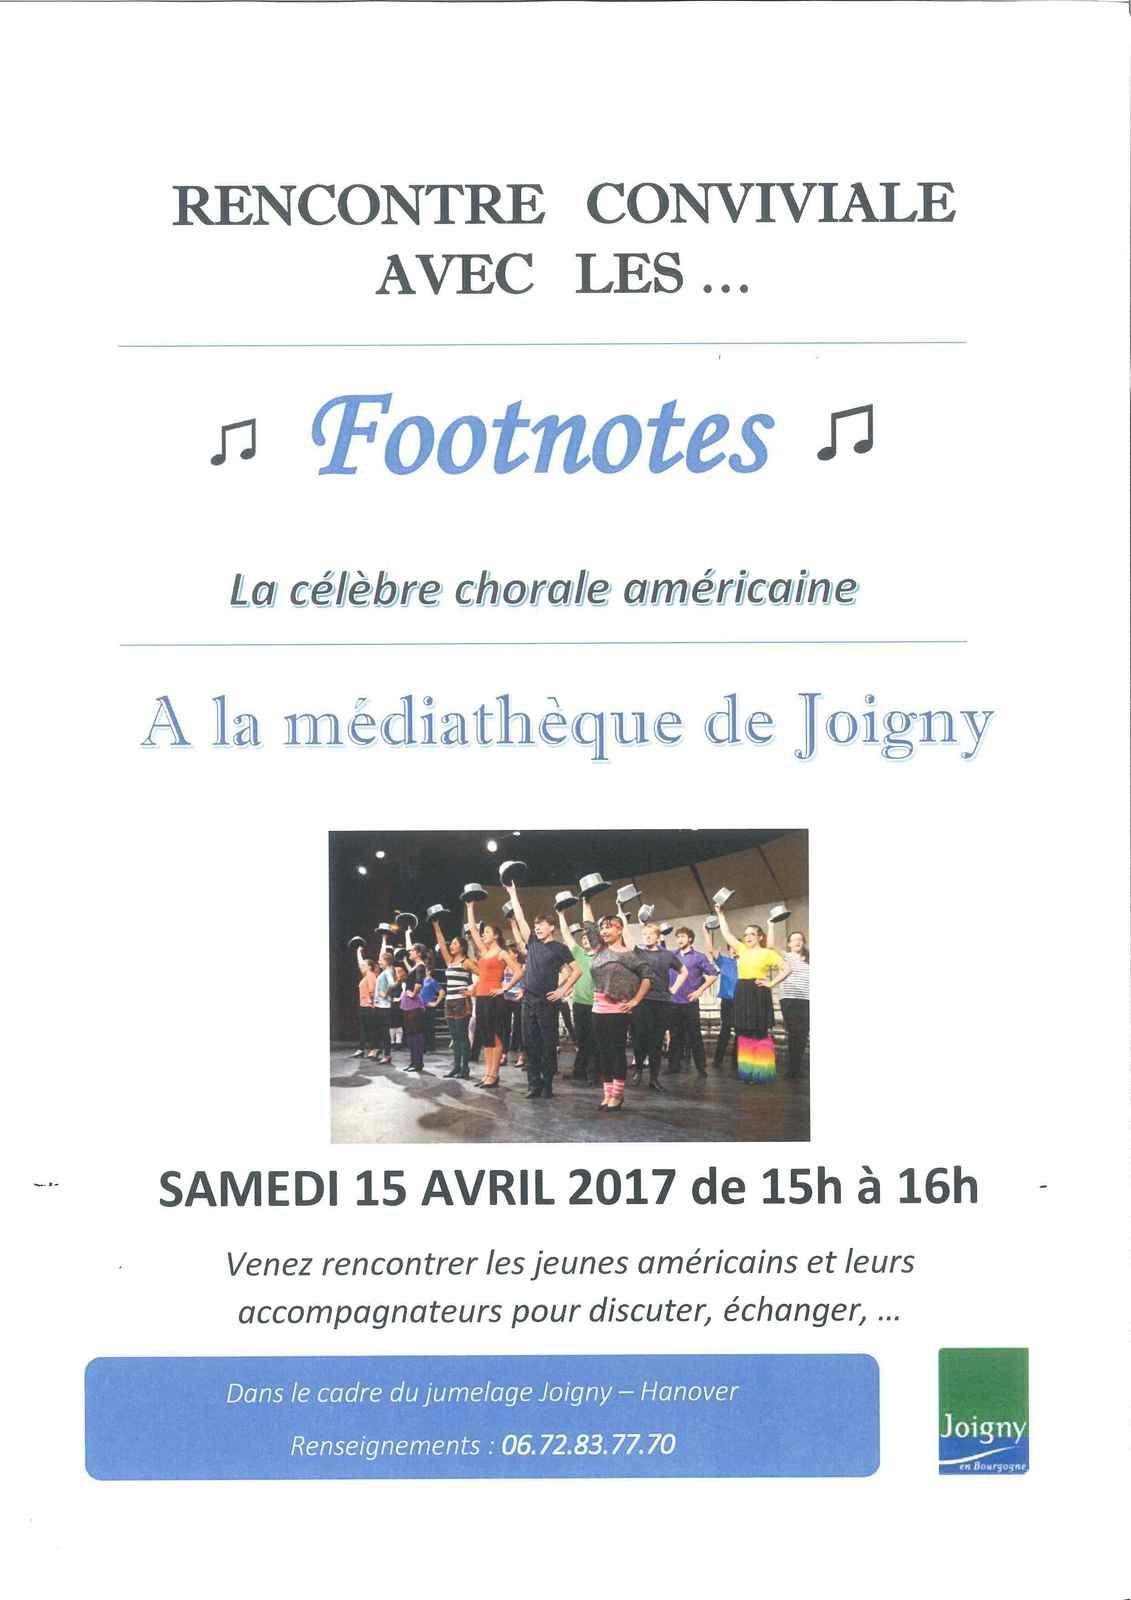 ARRIVEE DES FOOTNOTES DU 14 AU 22 AVRIL 2017 !!!